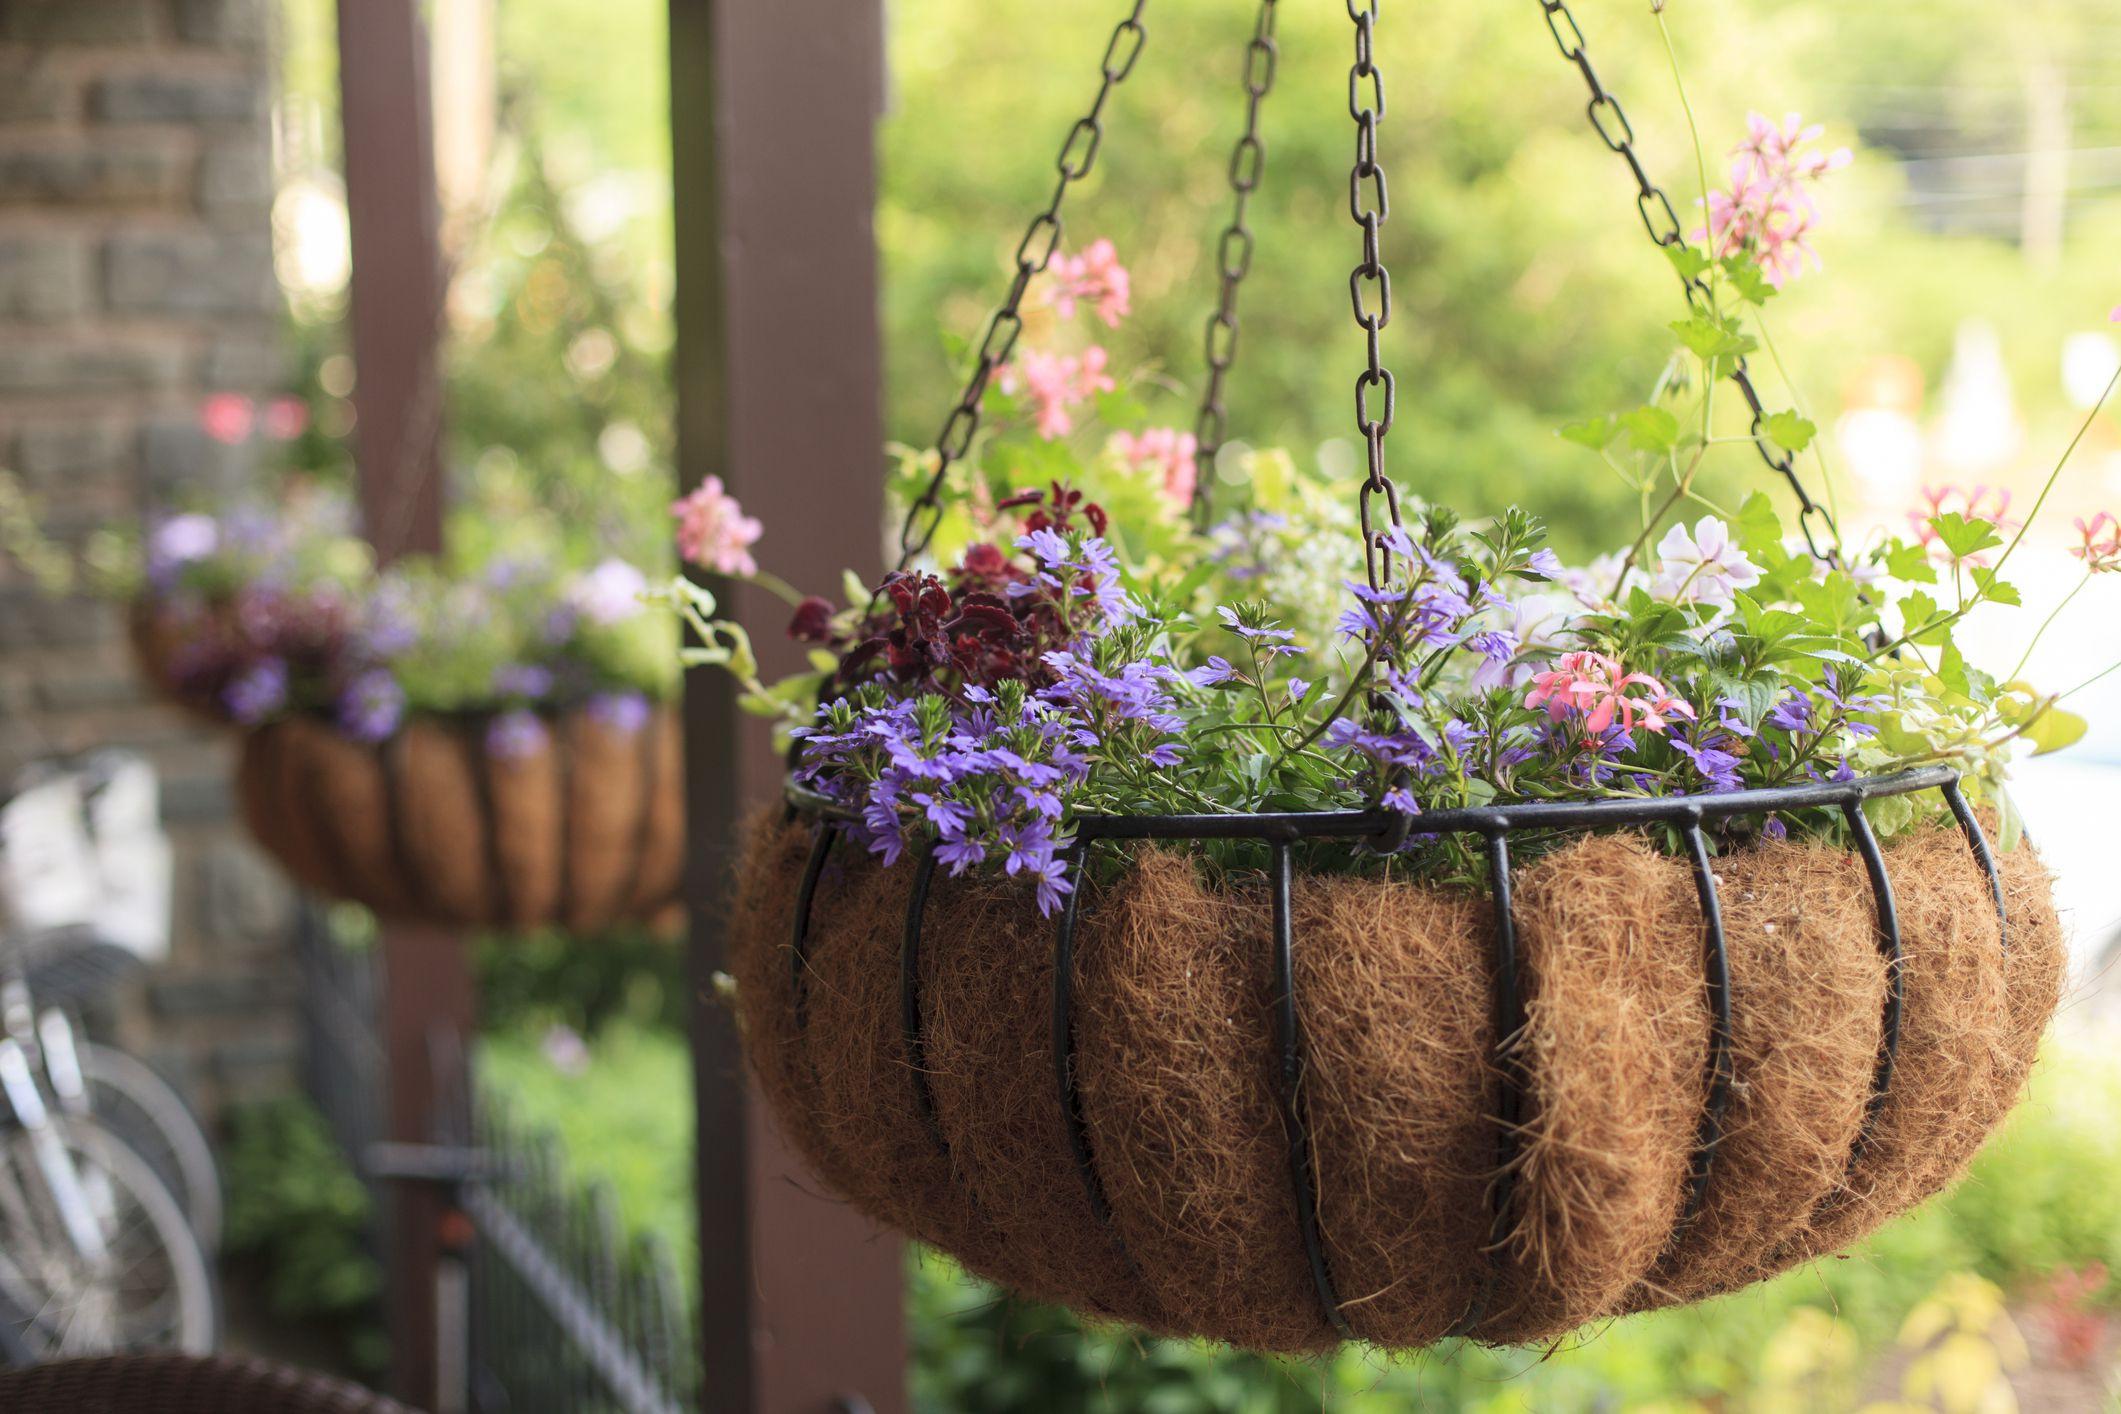 Hangingflowerbasket Getty 5a1e2fad482c f